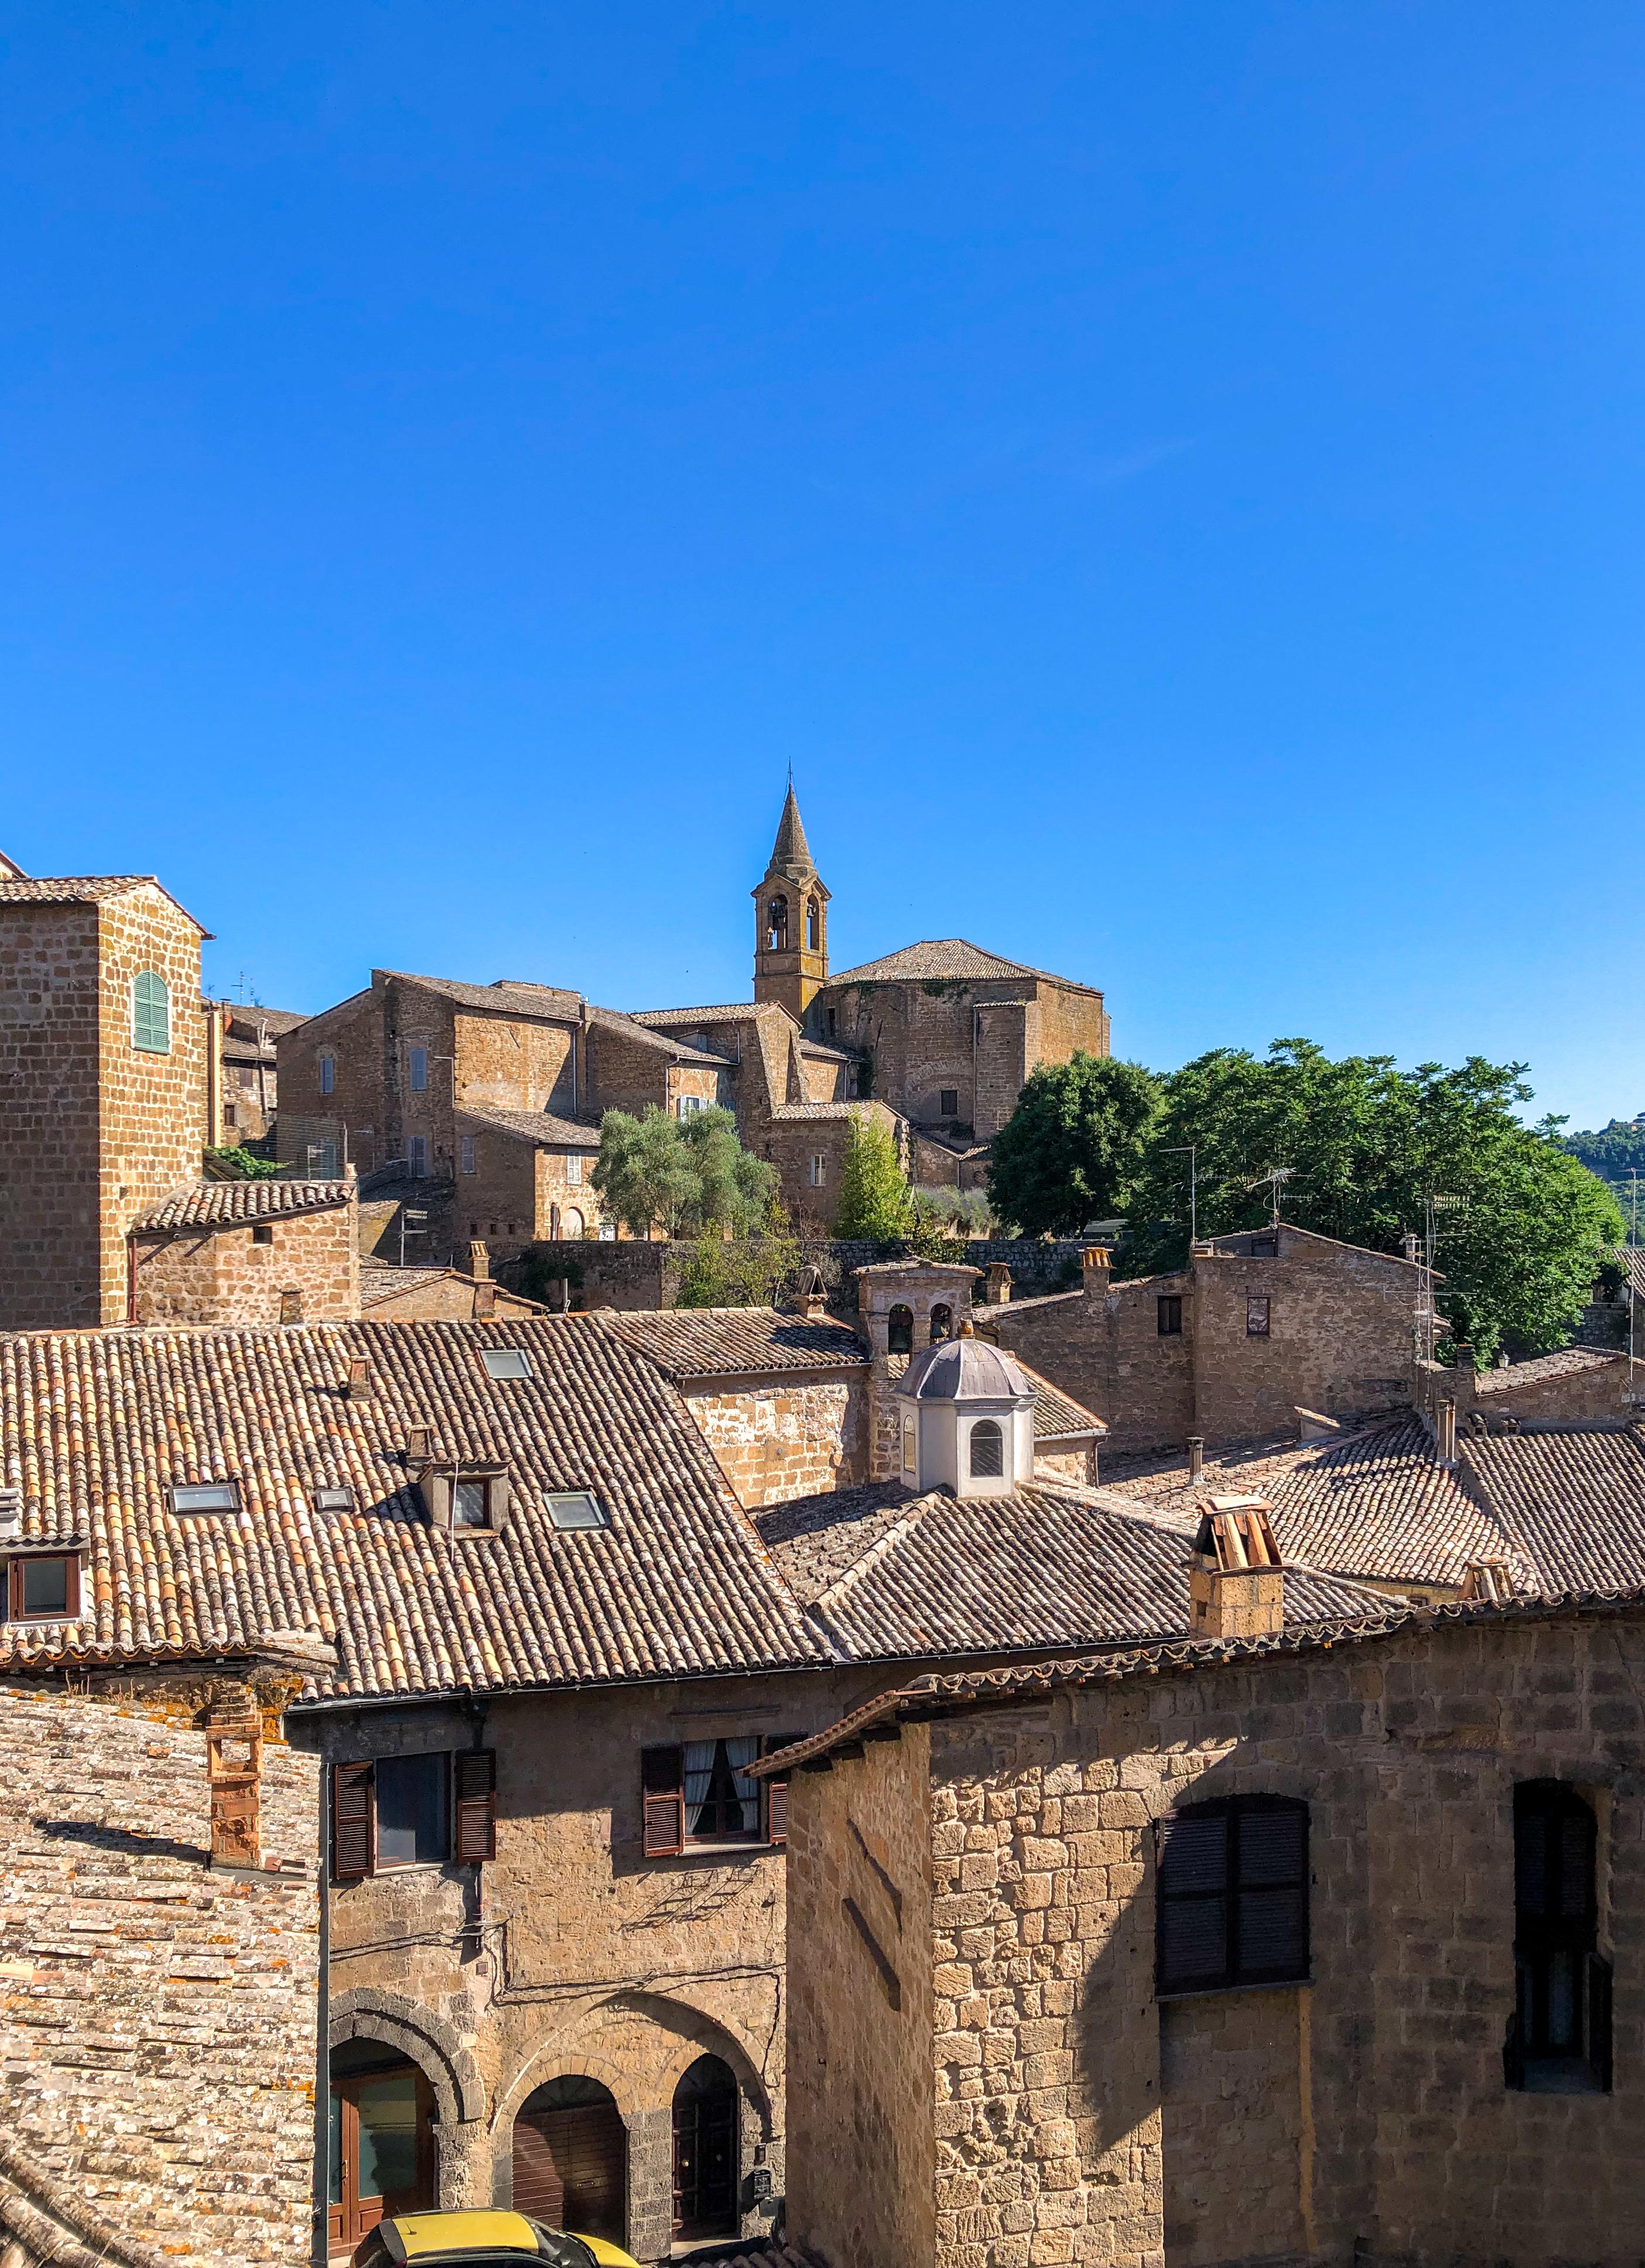 Italia - Italy - Casale Management - Travel - Orvieto - Centro storico